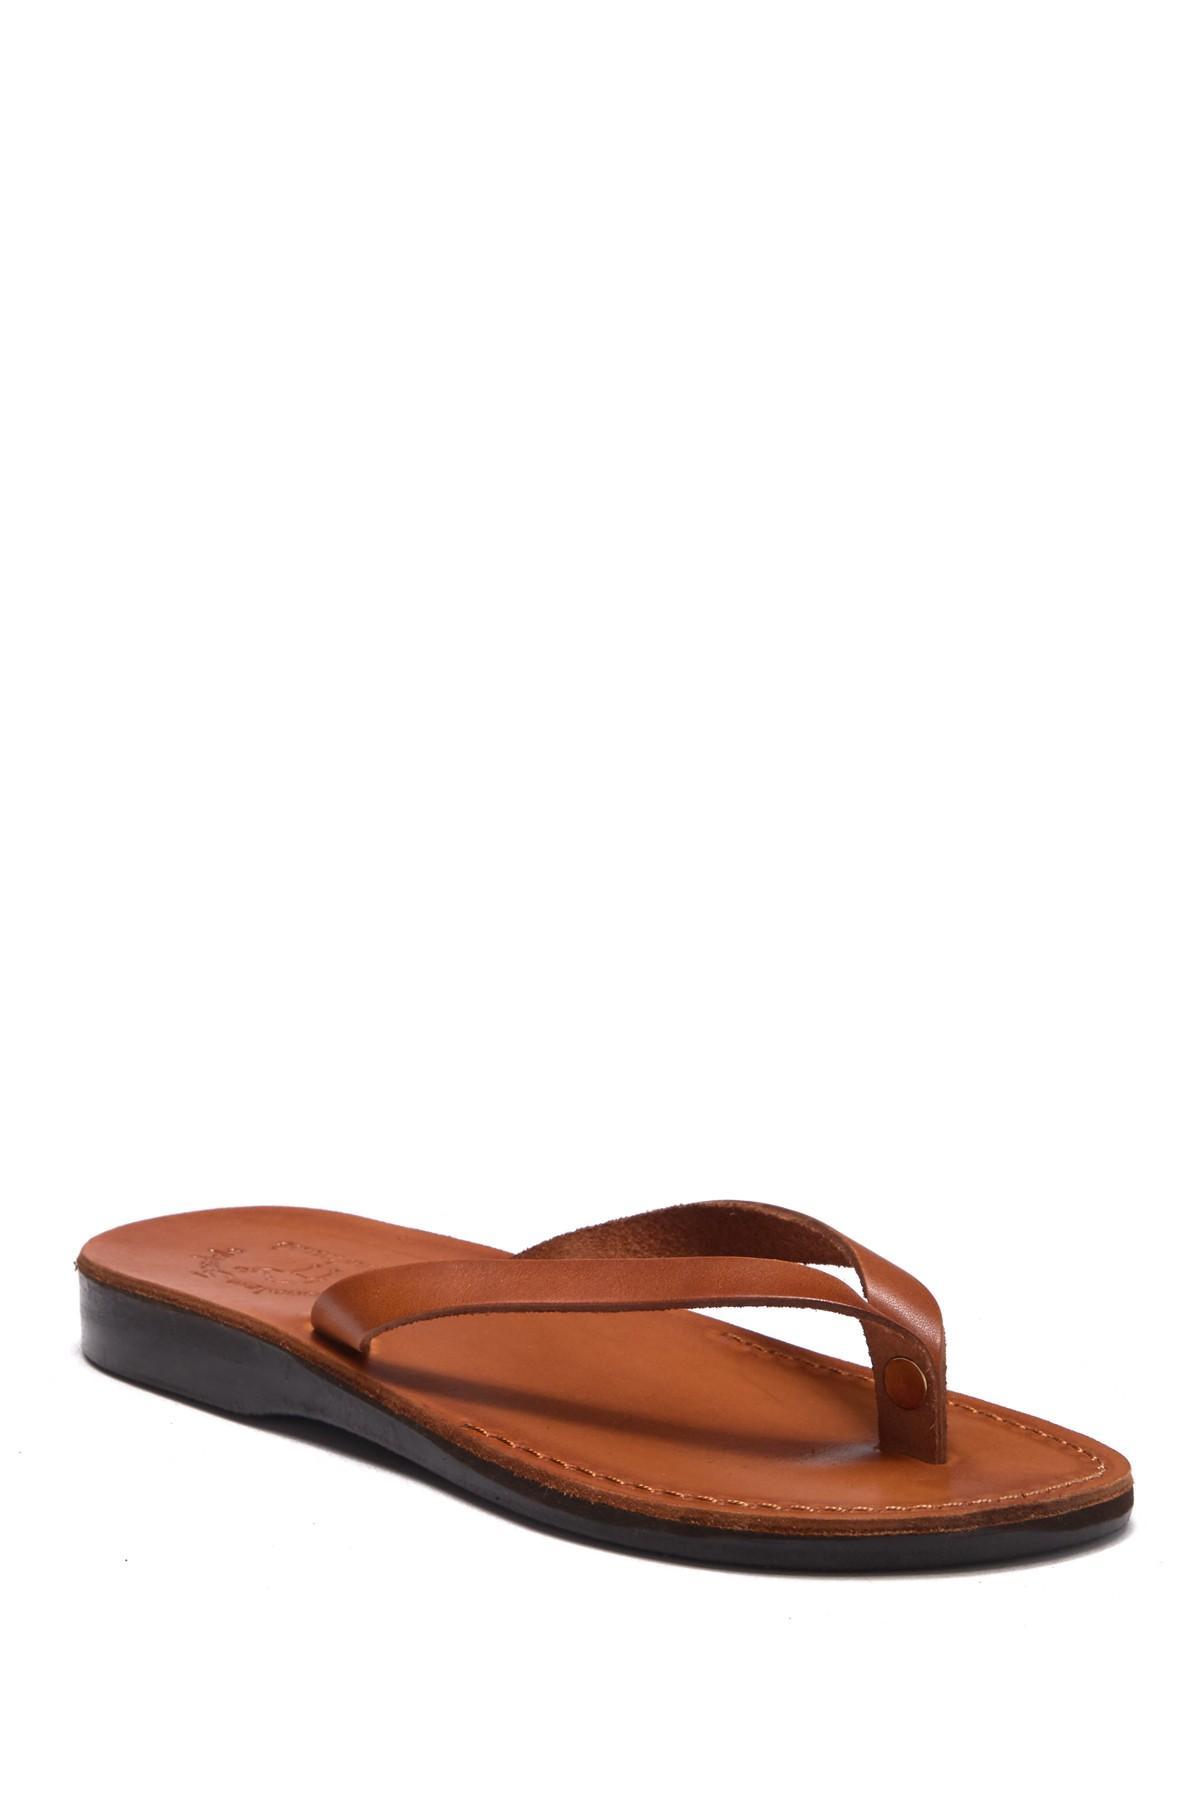 db5c3369faf89e Lyst - Jerusalem Sandals Jaffa Thong Sandal for Men